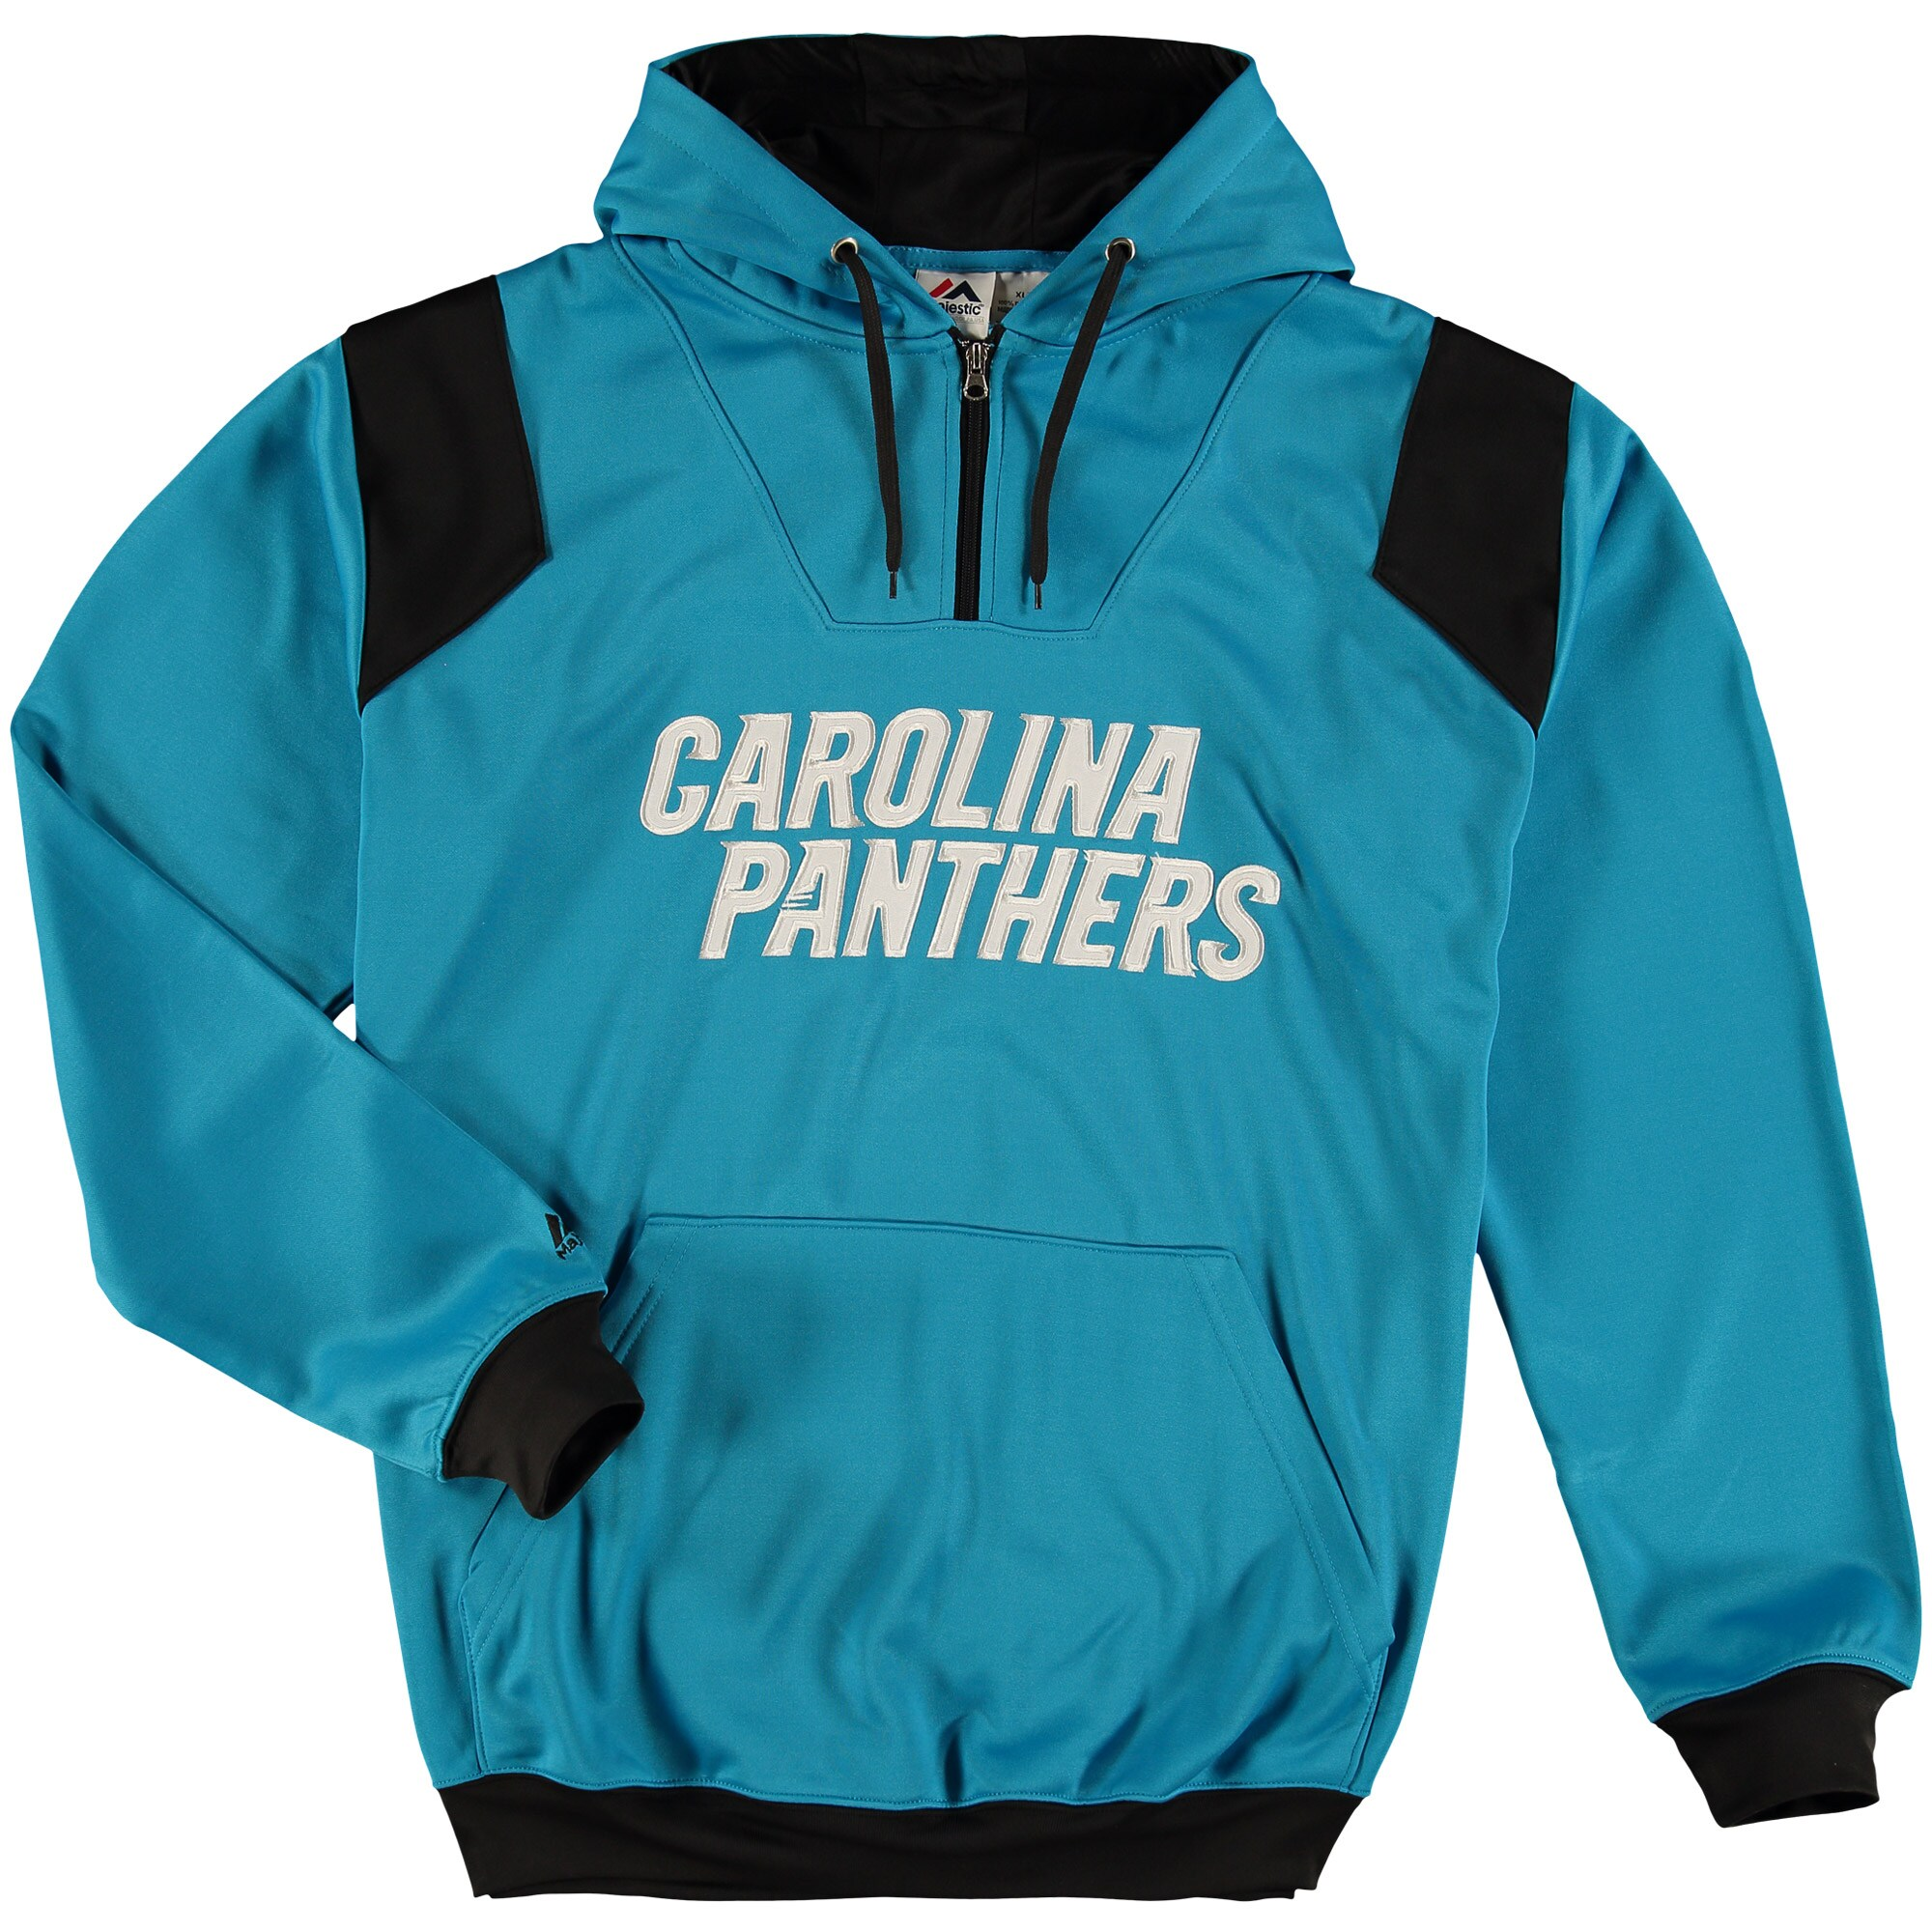 Carolina Panthers Majestic Big & Tall 1/4-Zip Pullover Hoodie - Blue